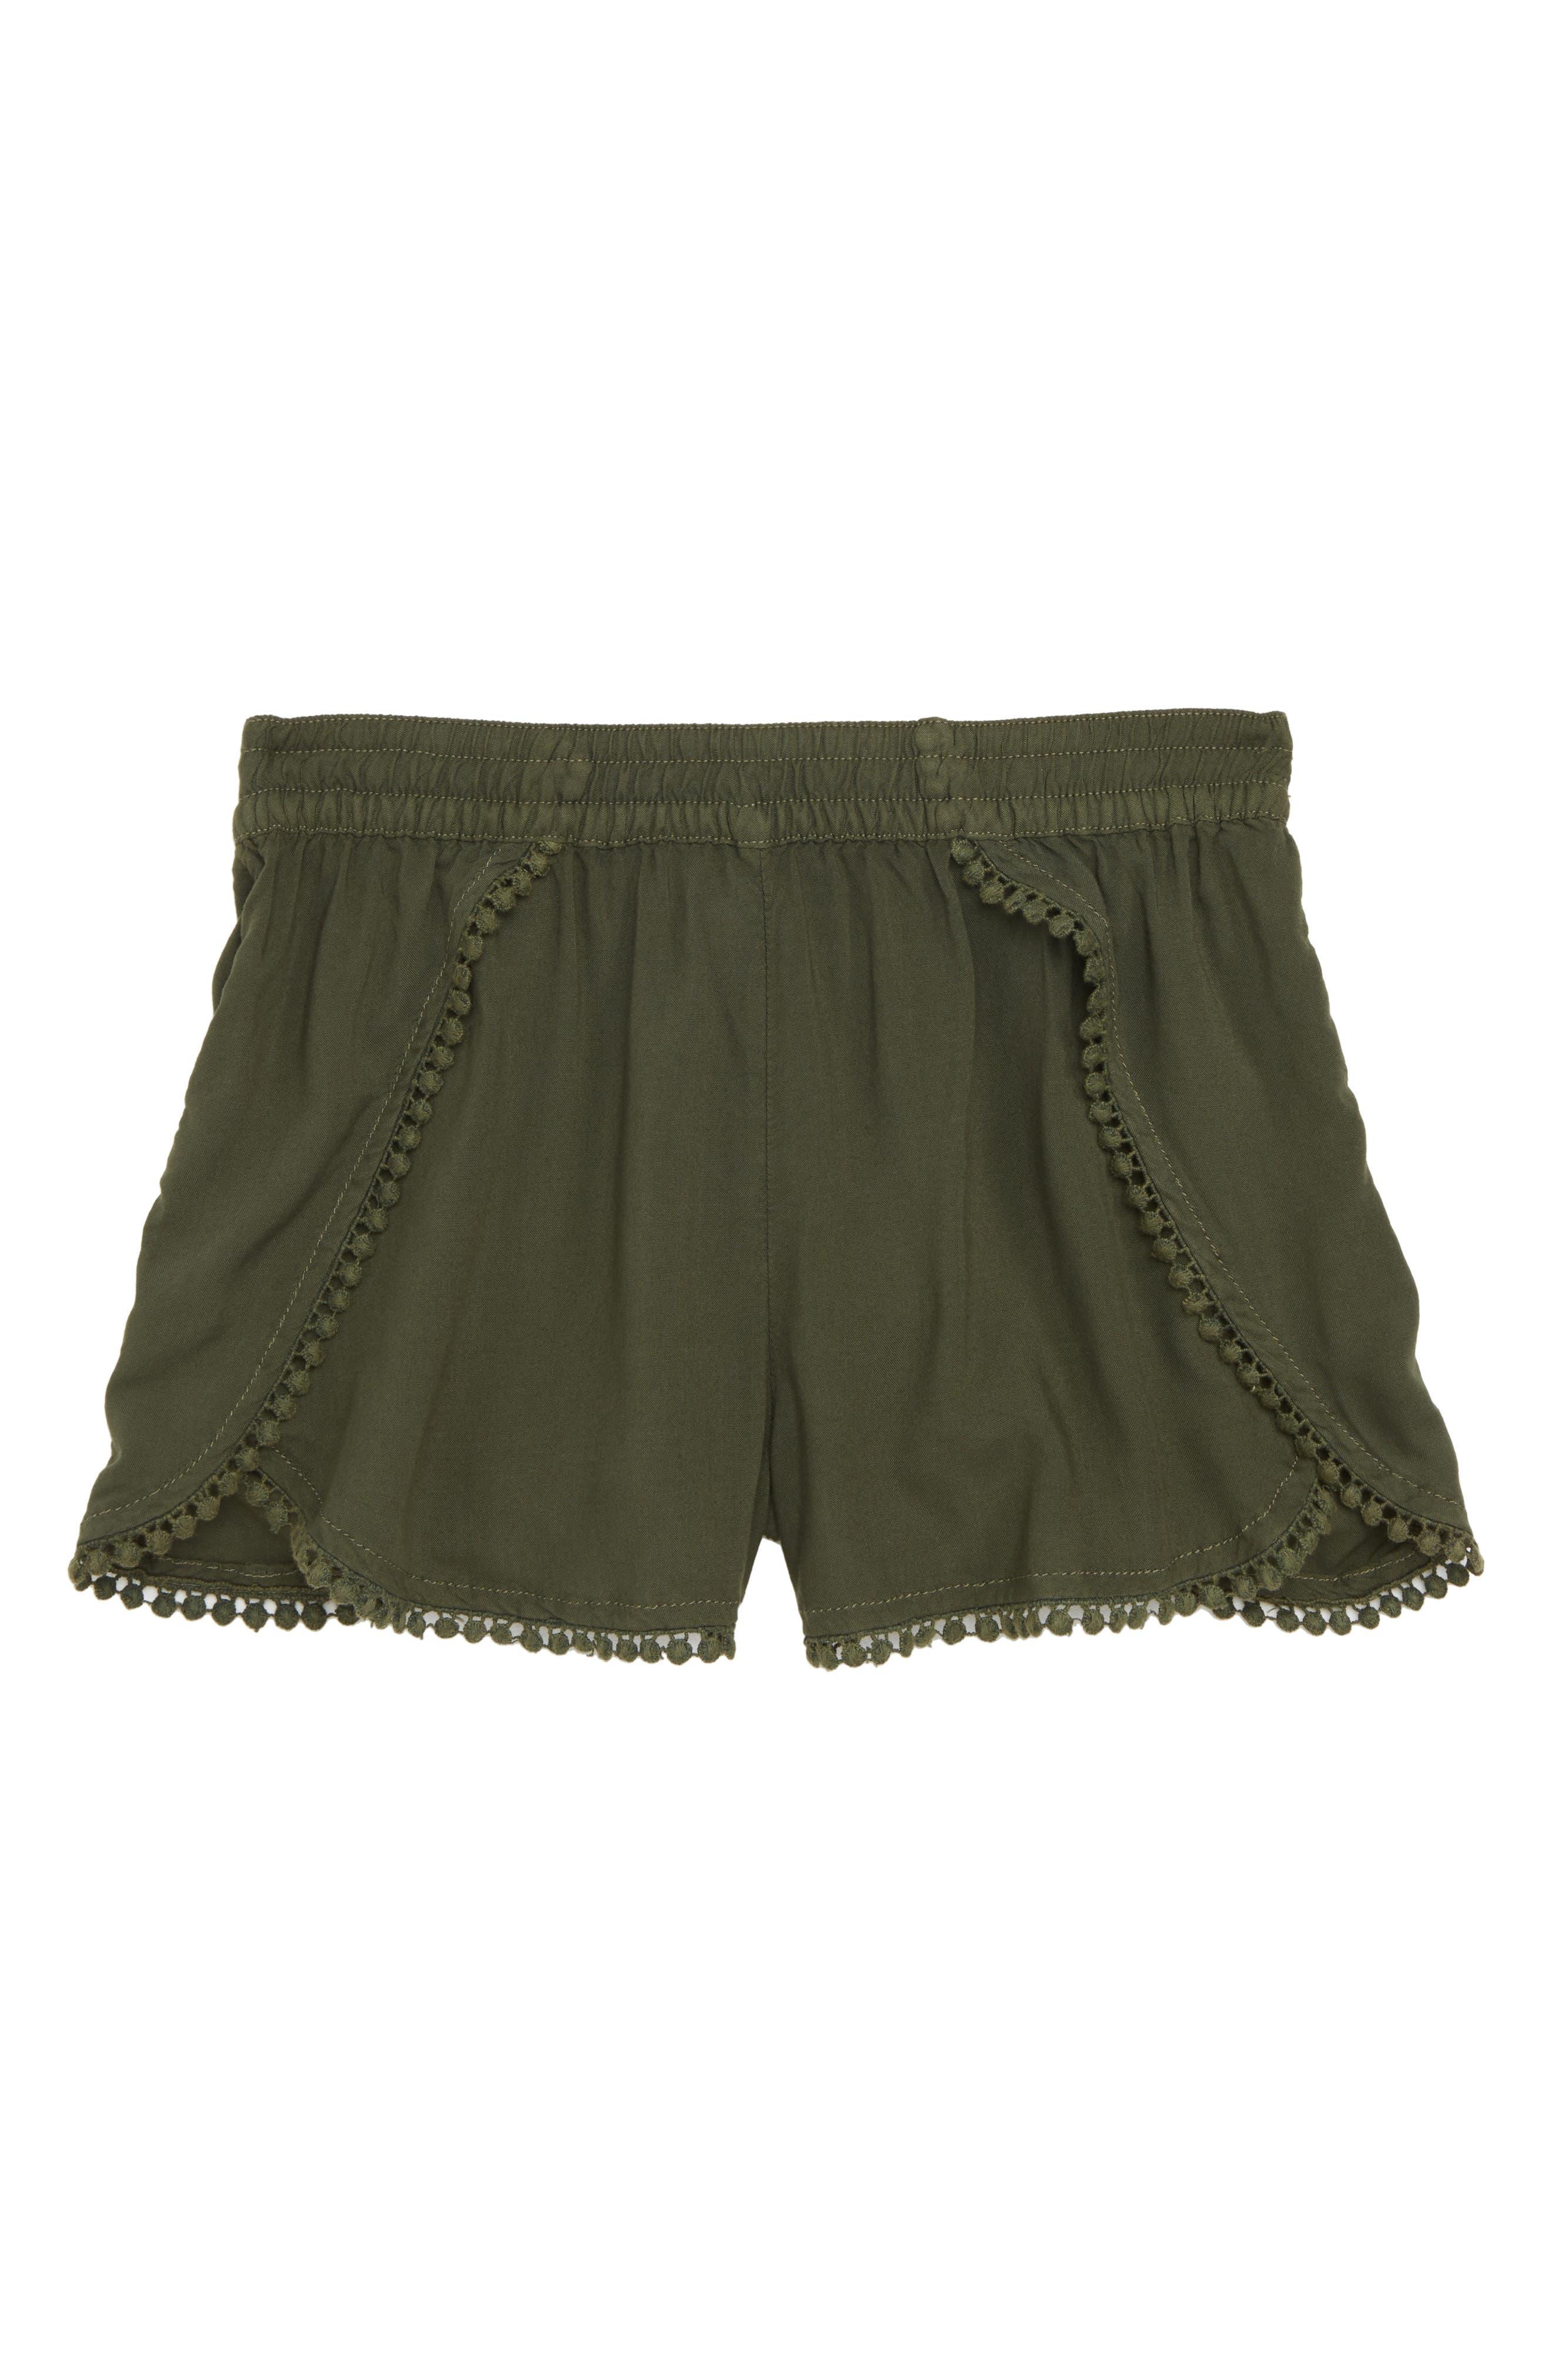 Main Image - Tucker + Tate Petal Shorts (Big Girls)